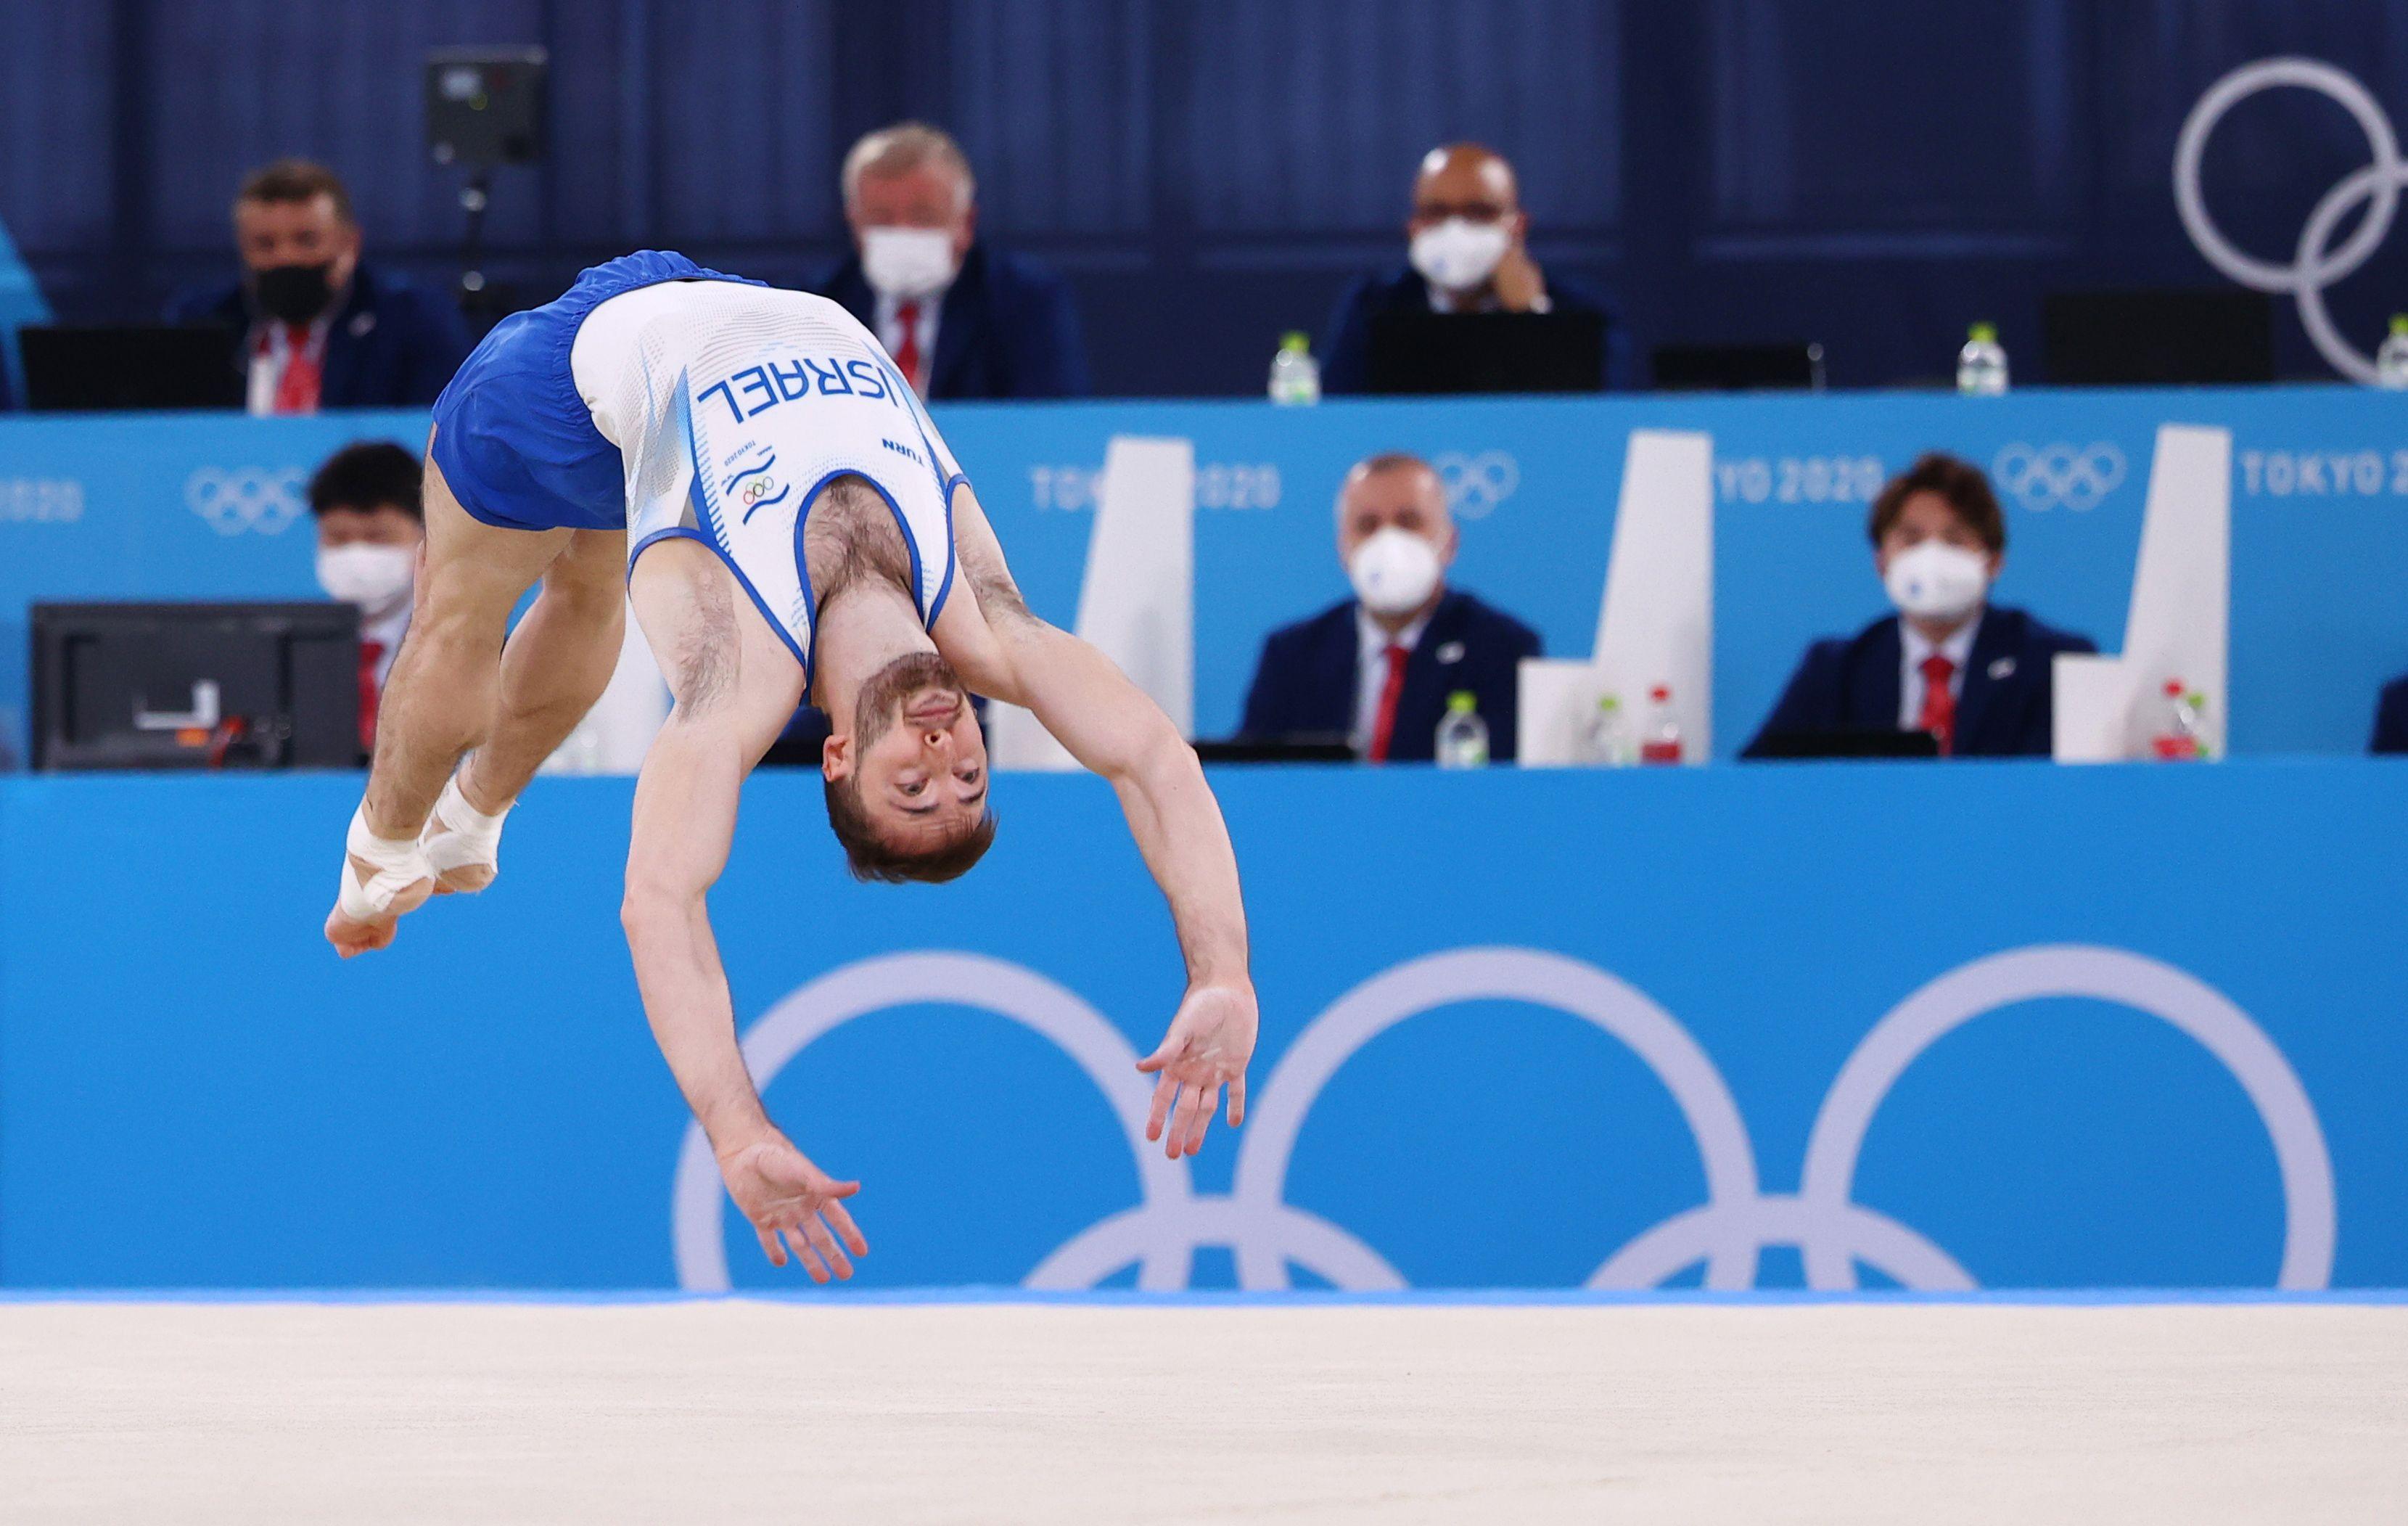 Tokyo 2020 Olympics - Gymnastics - Artistic - Men's Floor Exercise - Final - Ariake Gymnastics Centre, Tokyo, Japan - August 1, 2021.  Artem Dolgopyat of Israel in action during the floor exercise. REUTERS/Lindsey Wasson